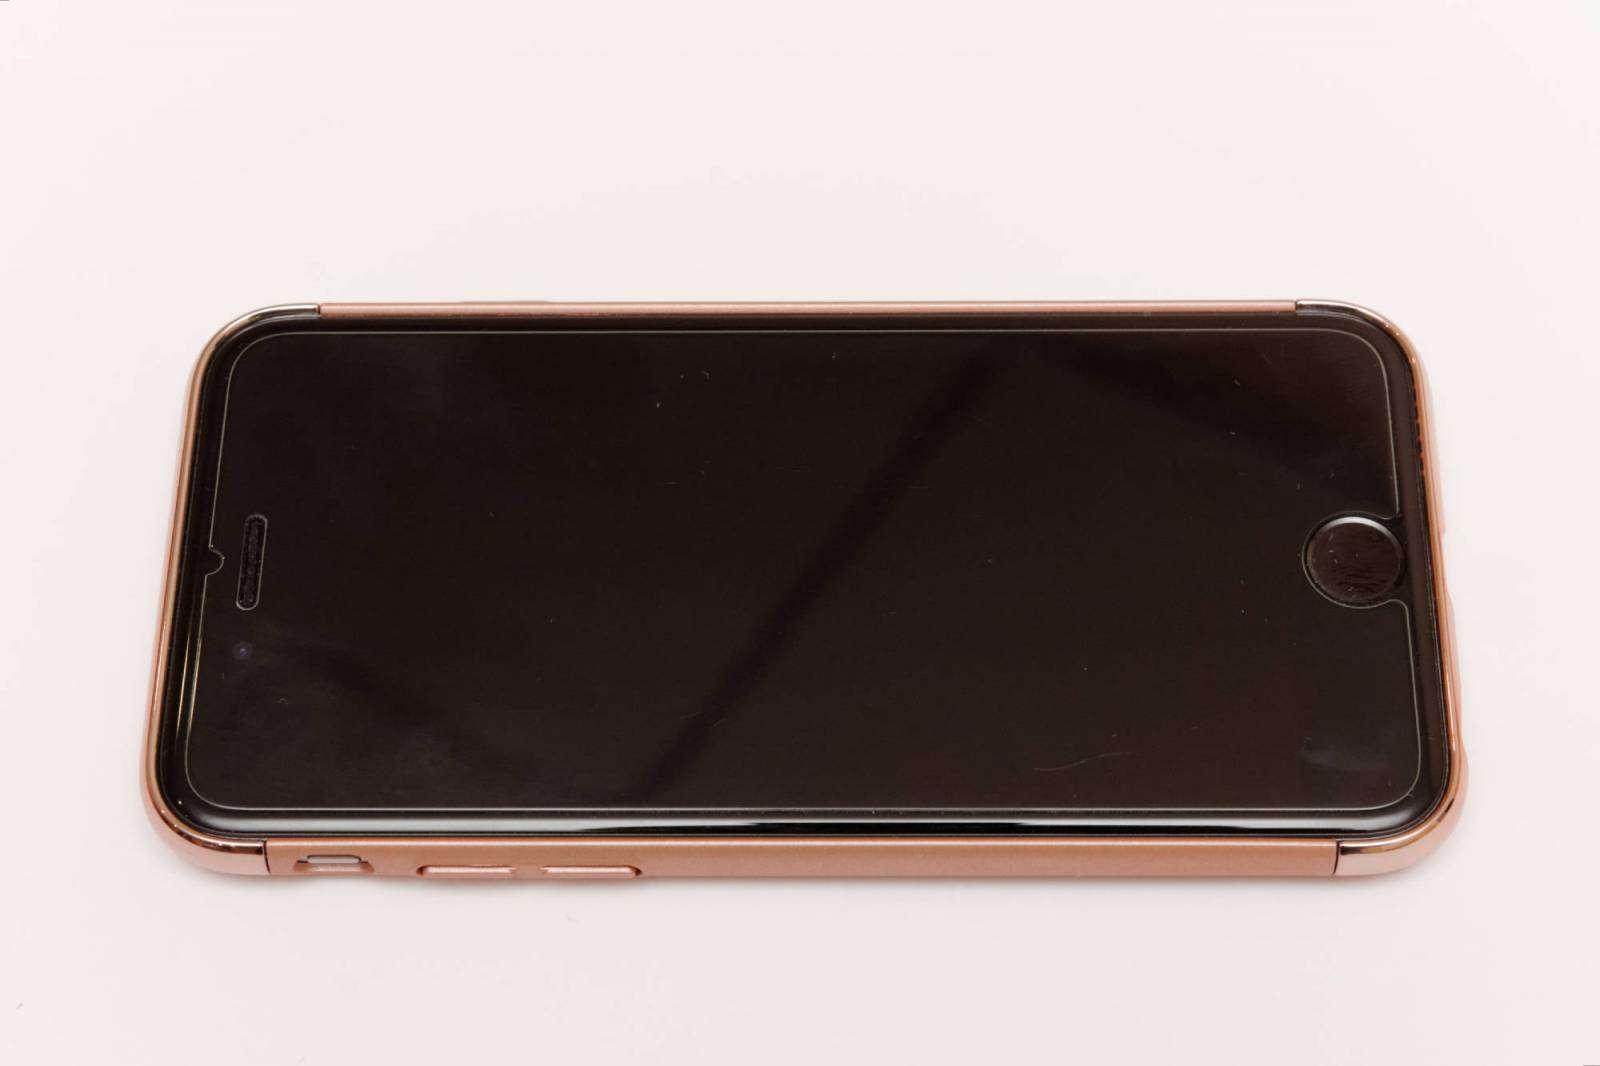 Aliexpress: Пластиковый чехол для iPhone 6 6S